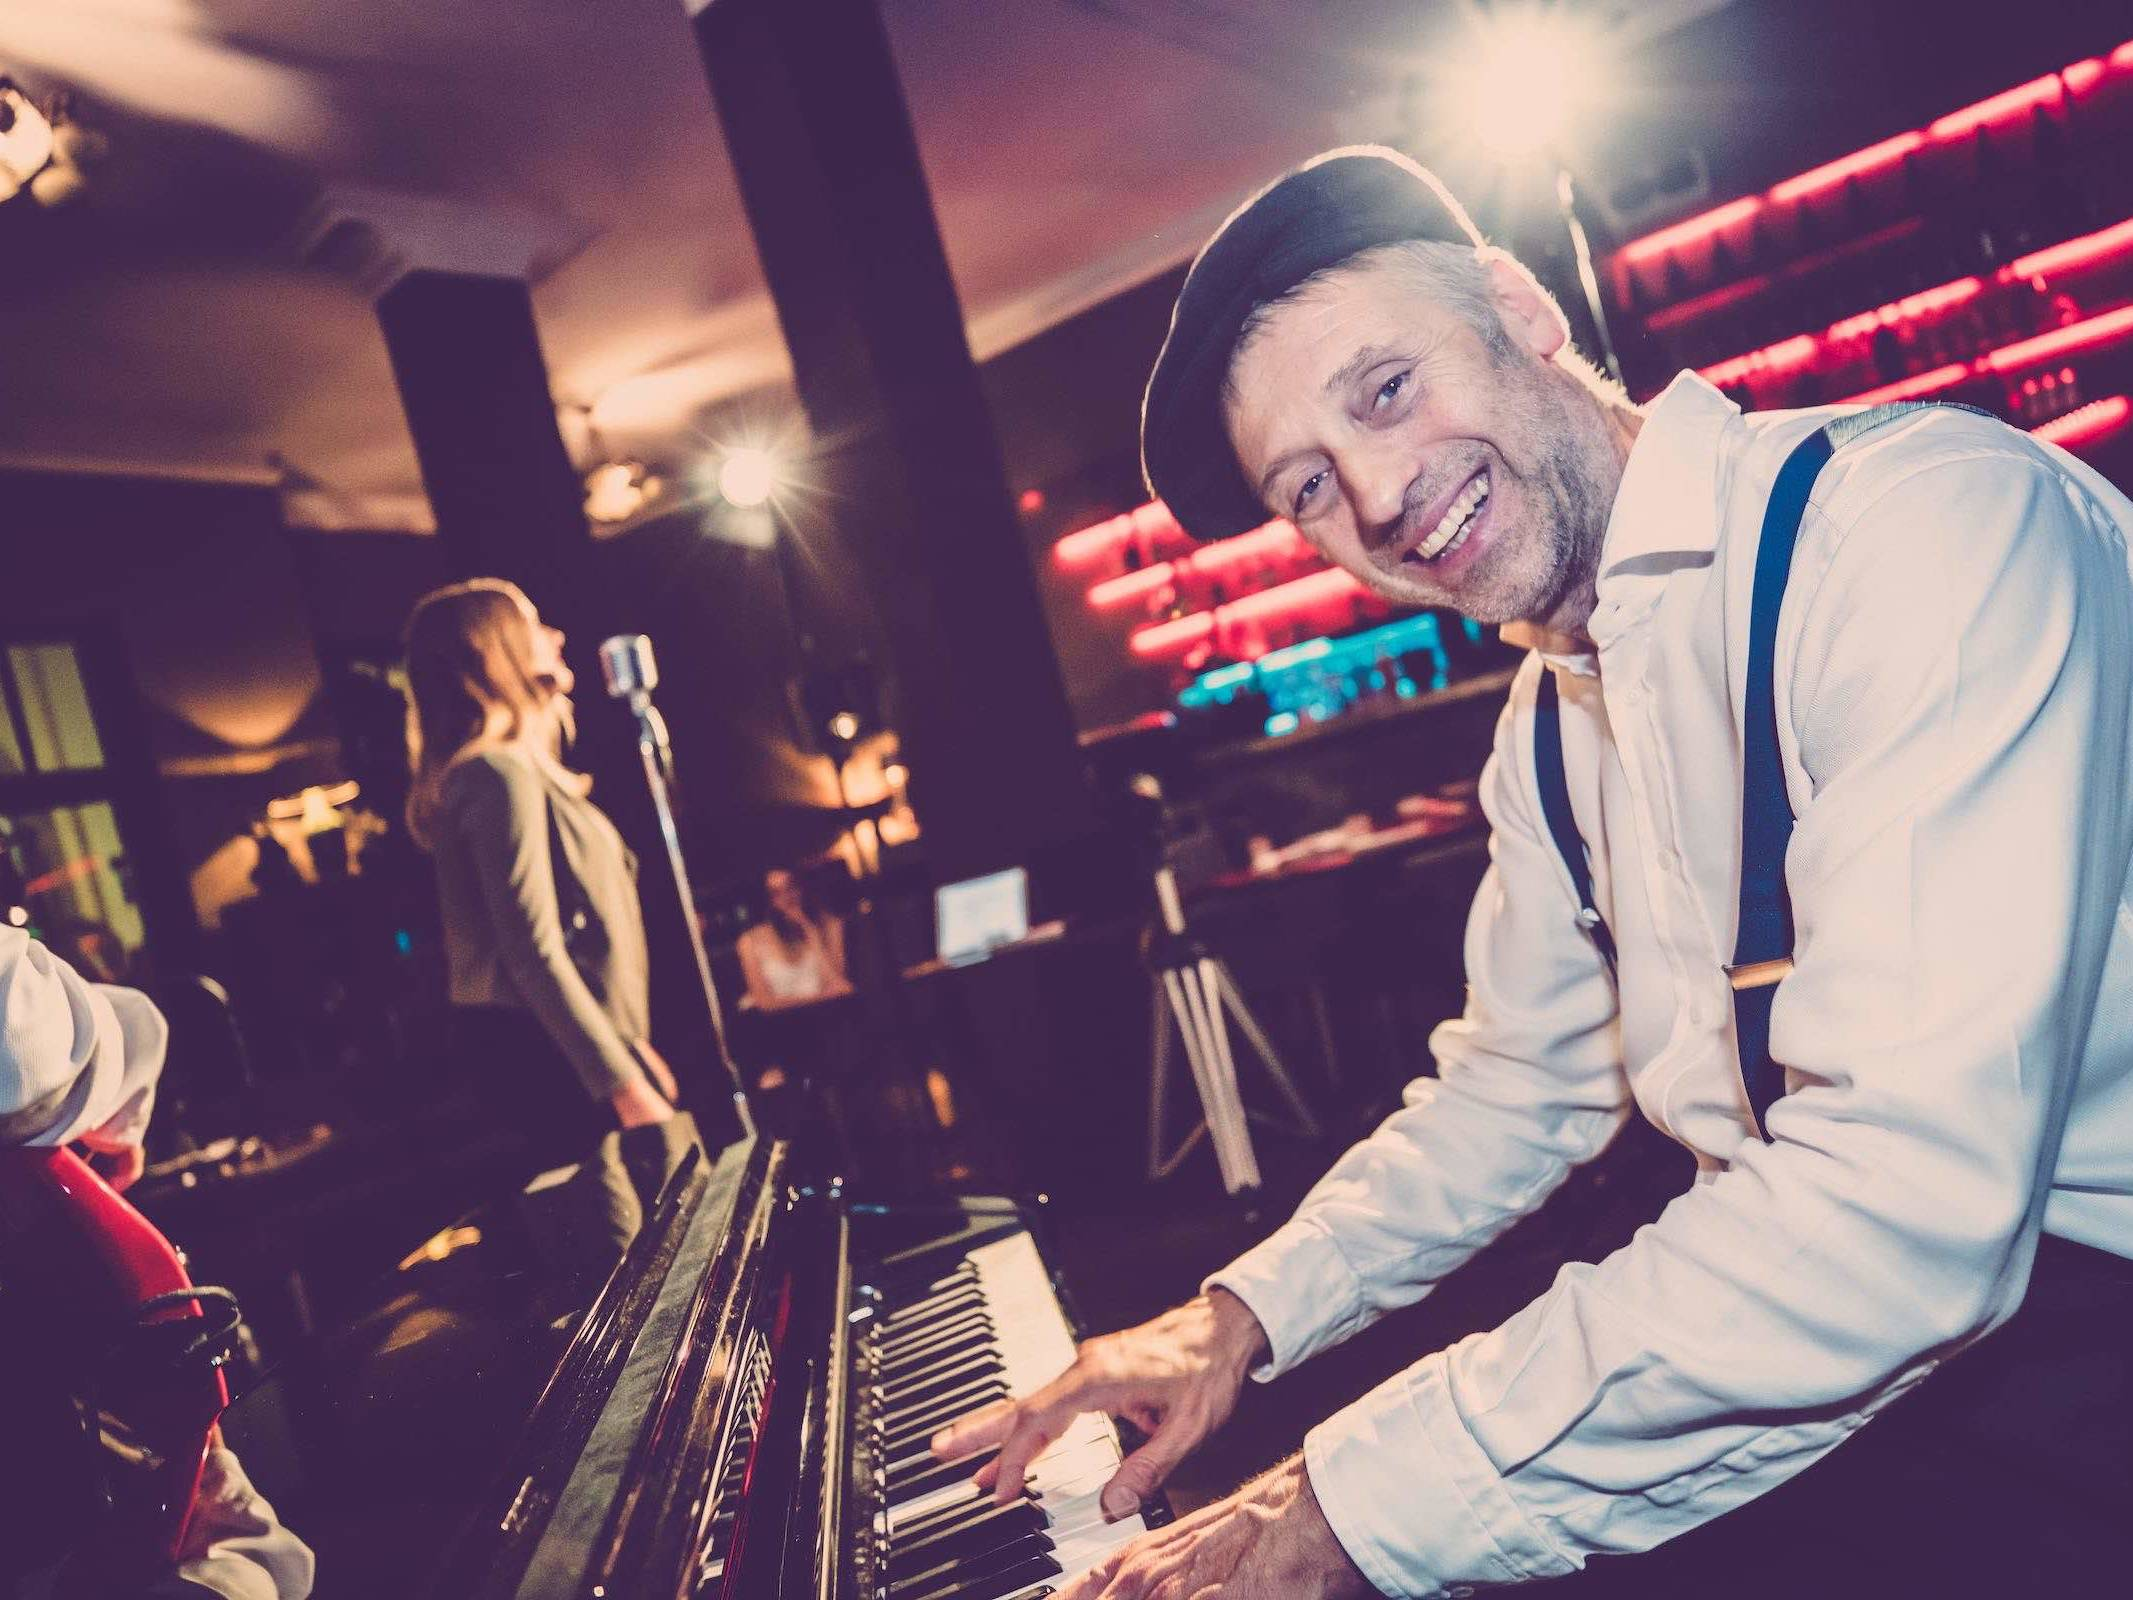 Band   Hamburg   Liveband   Livemusik   Partyband   Jazzband   Swingband   Popband   Jazz   Motown   Soul   Pianist   Klavierspieler   Hochzeit   Messe   Firmenfeier   Charity   Gala   Buchen   Mieten   Anfragen   Hamburgfeiert